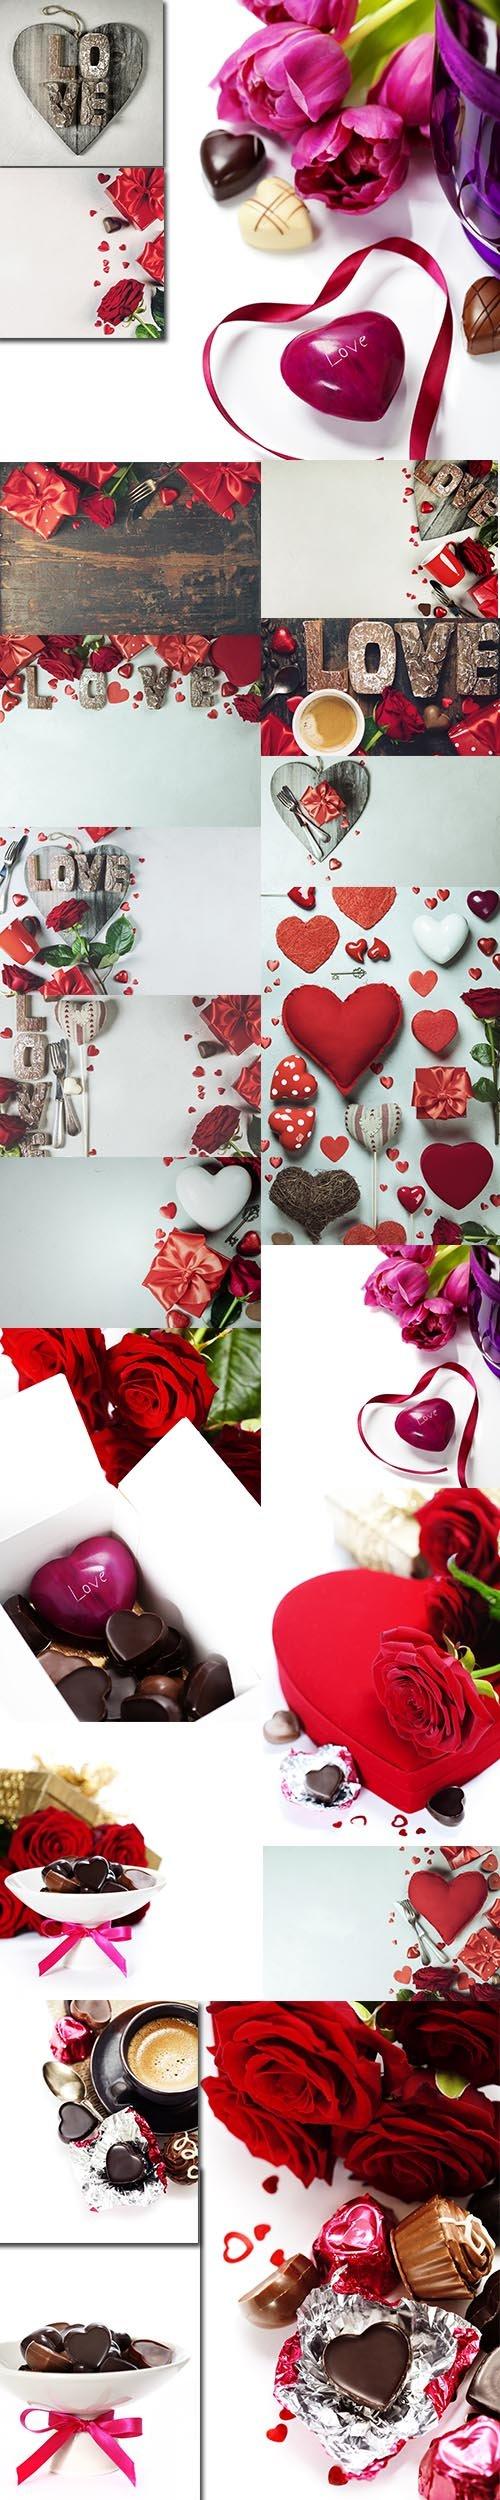 Premium Vector Stock Images Set - Valentines Day Background